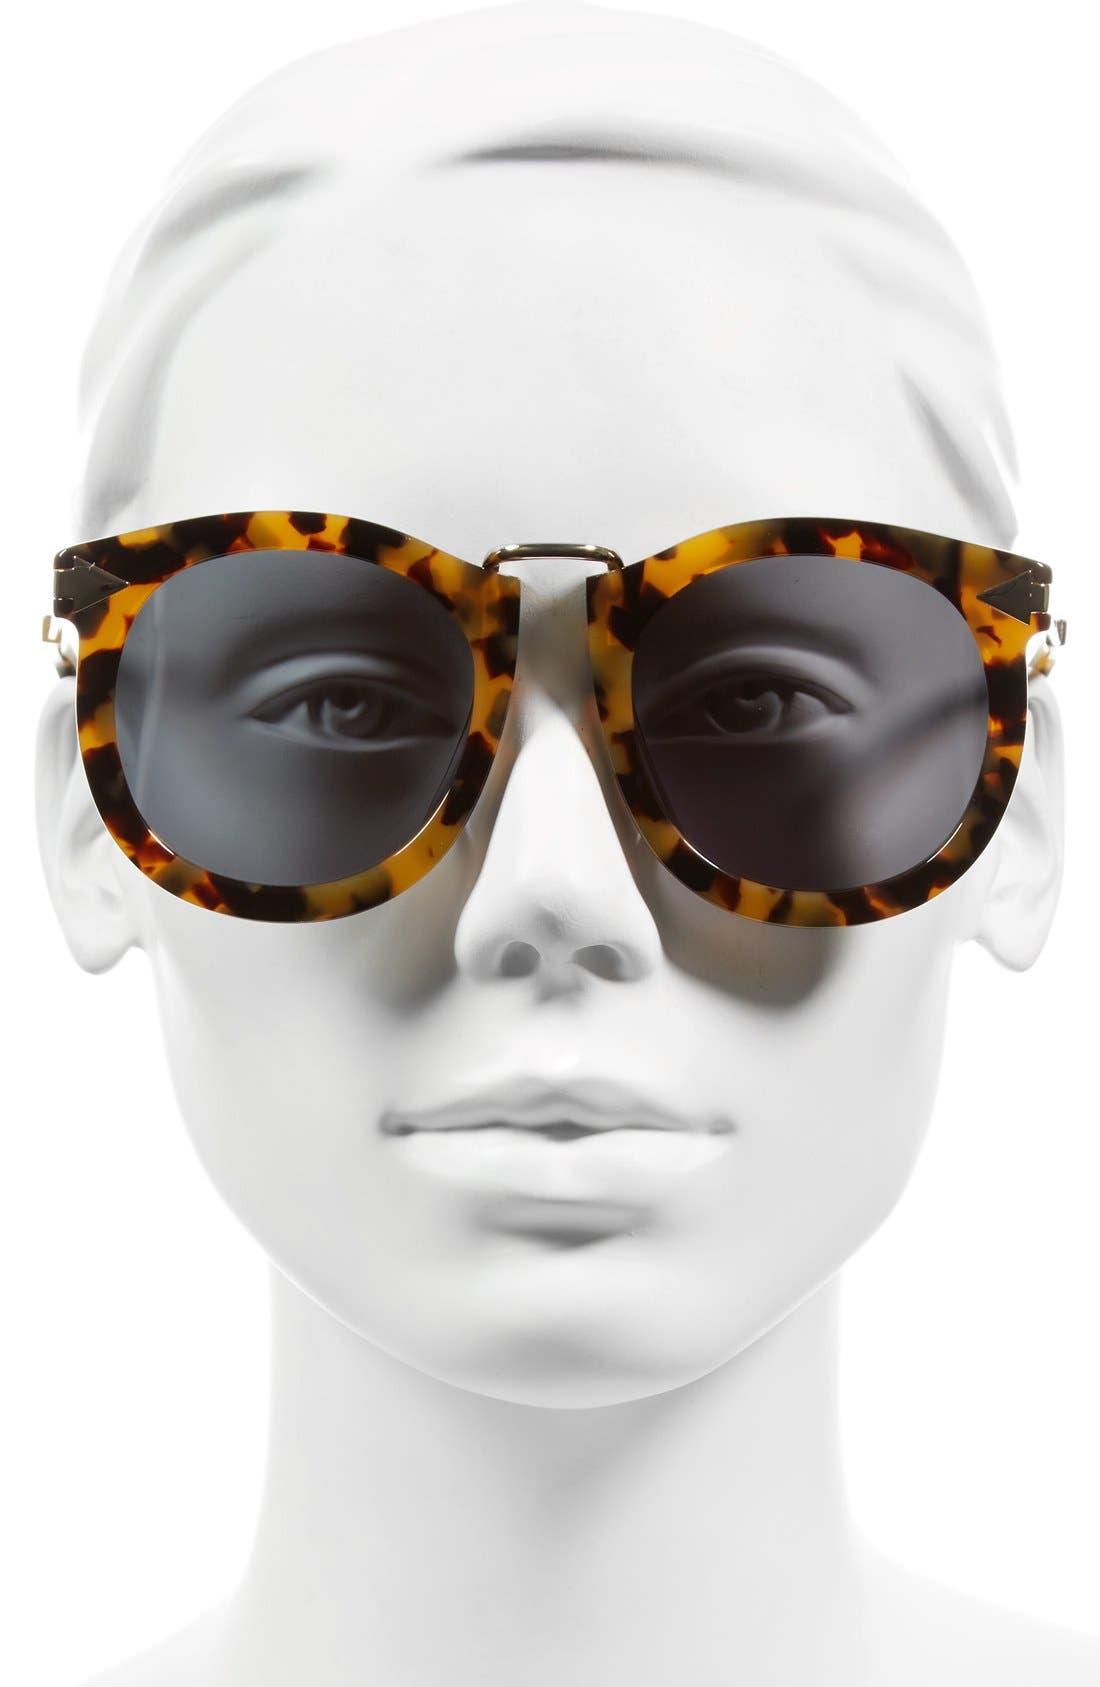 Alternative Fit Super Lunar - Arrowed by Karen 50mm Sunglasses,                             Alternate thumbnail 8, color,